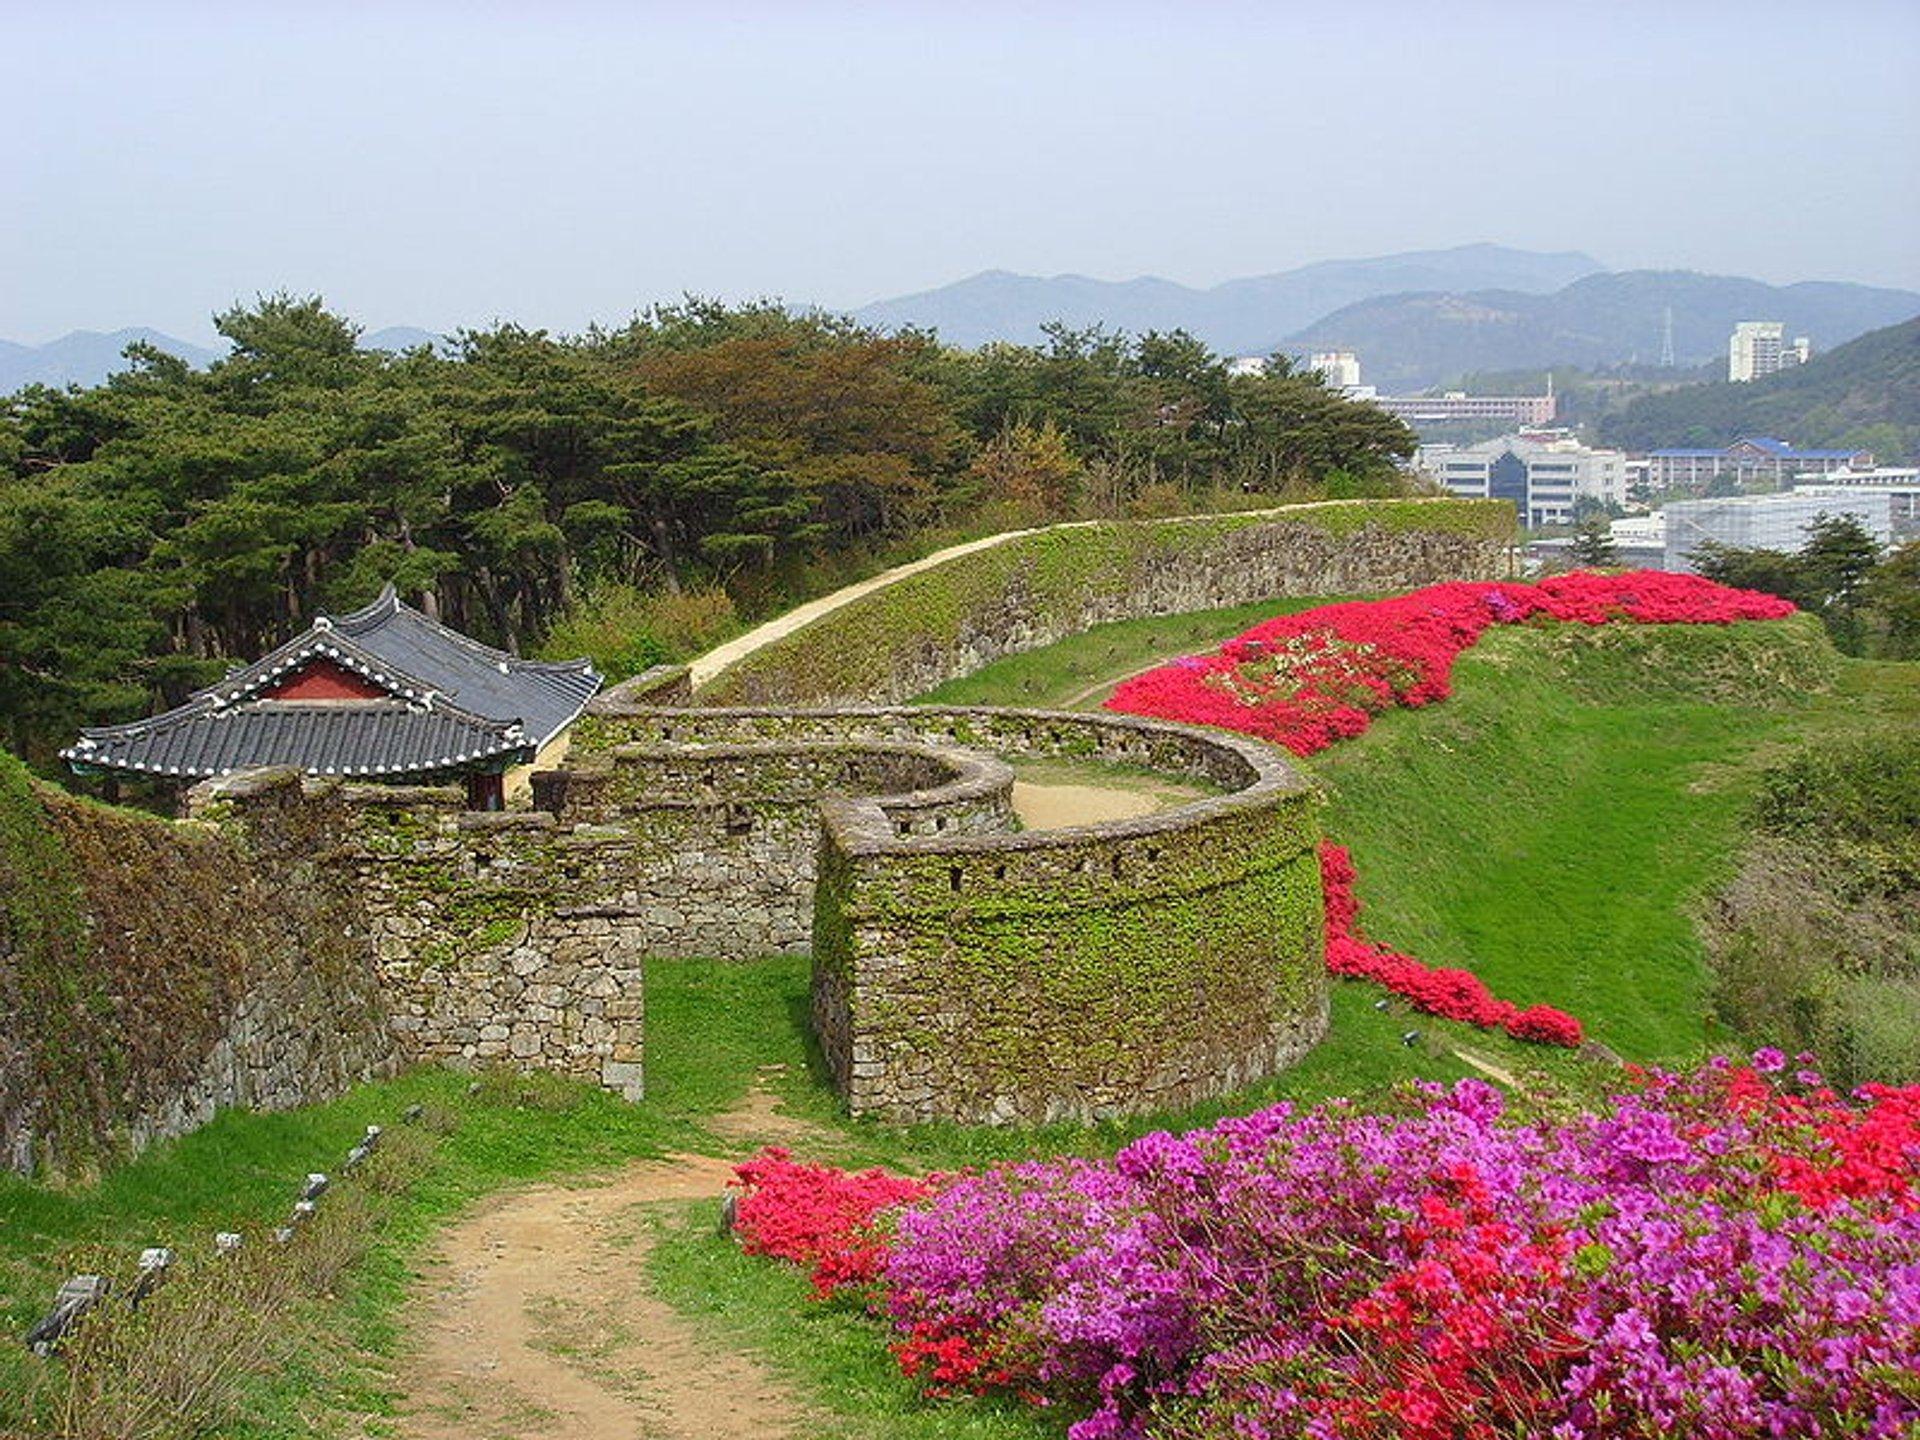 Gochang Moyang Fortress Festival in South Korea 2020 - Best Time